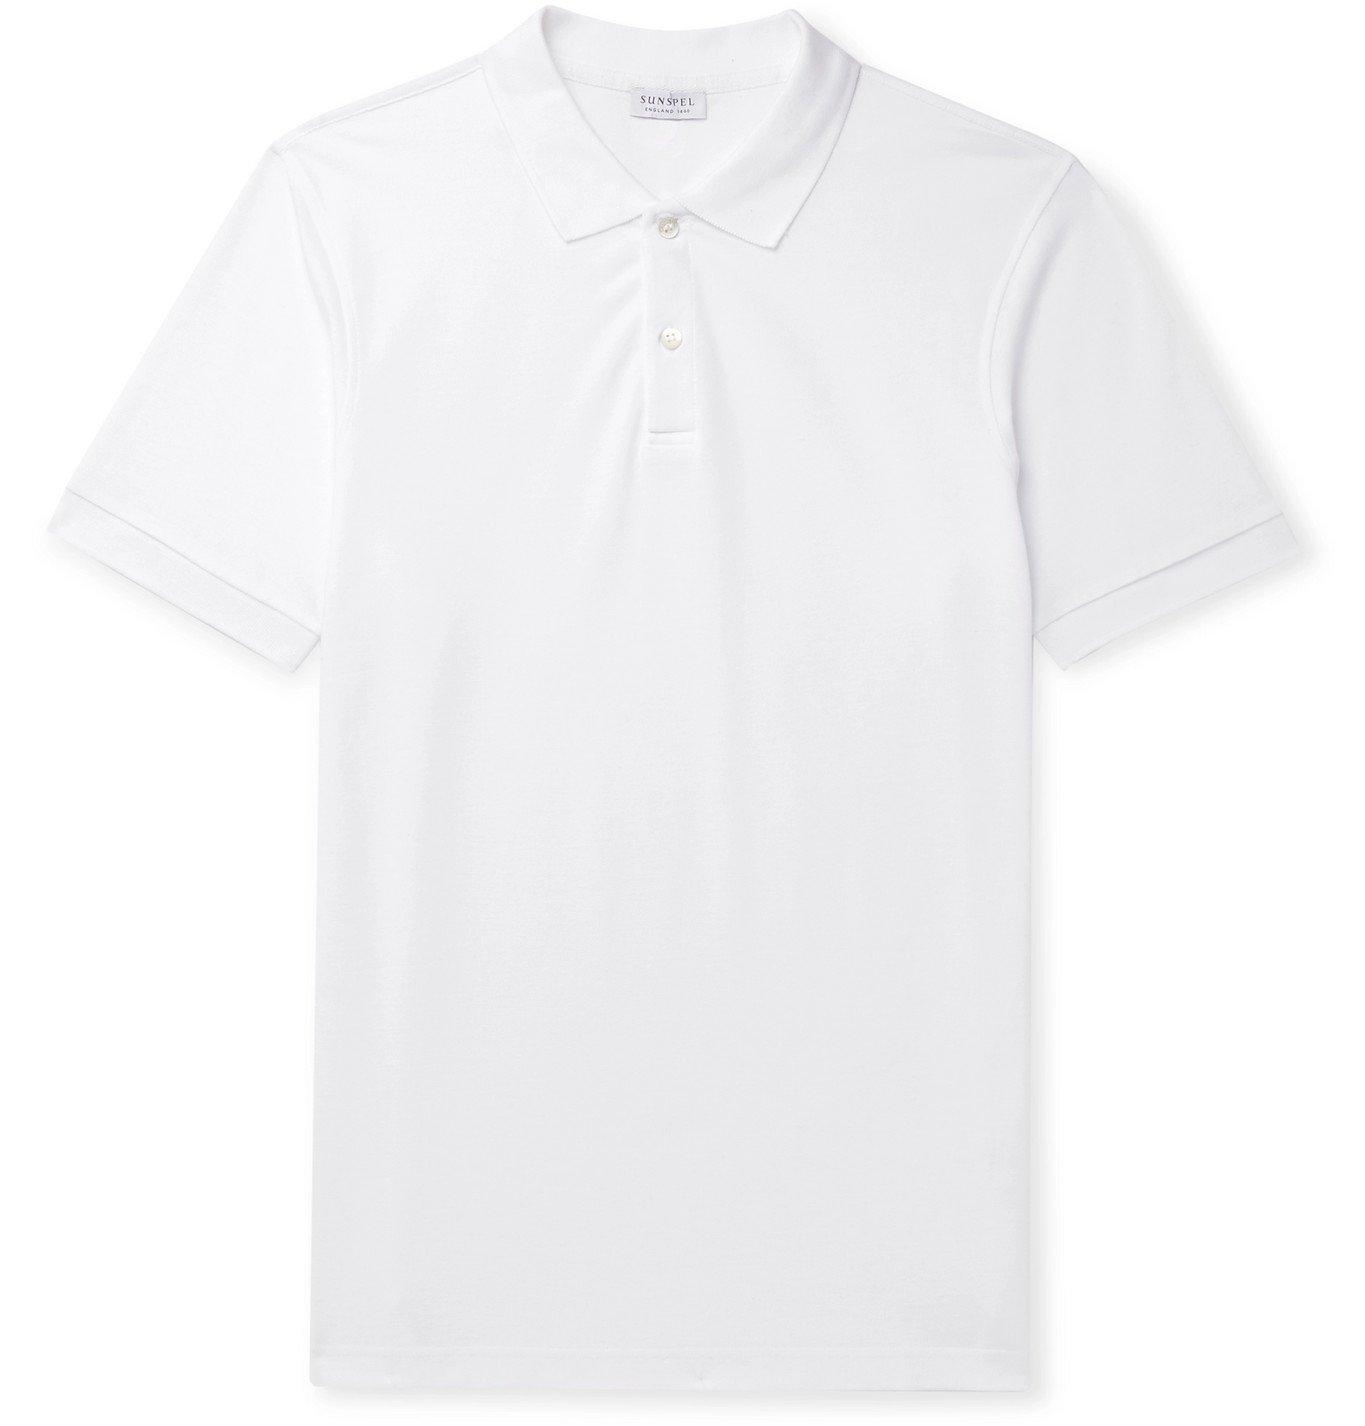 Sunspel - Cotton-Piqué Polo Shirt - White